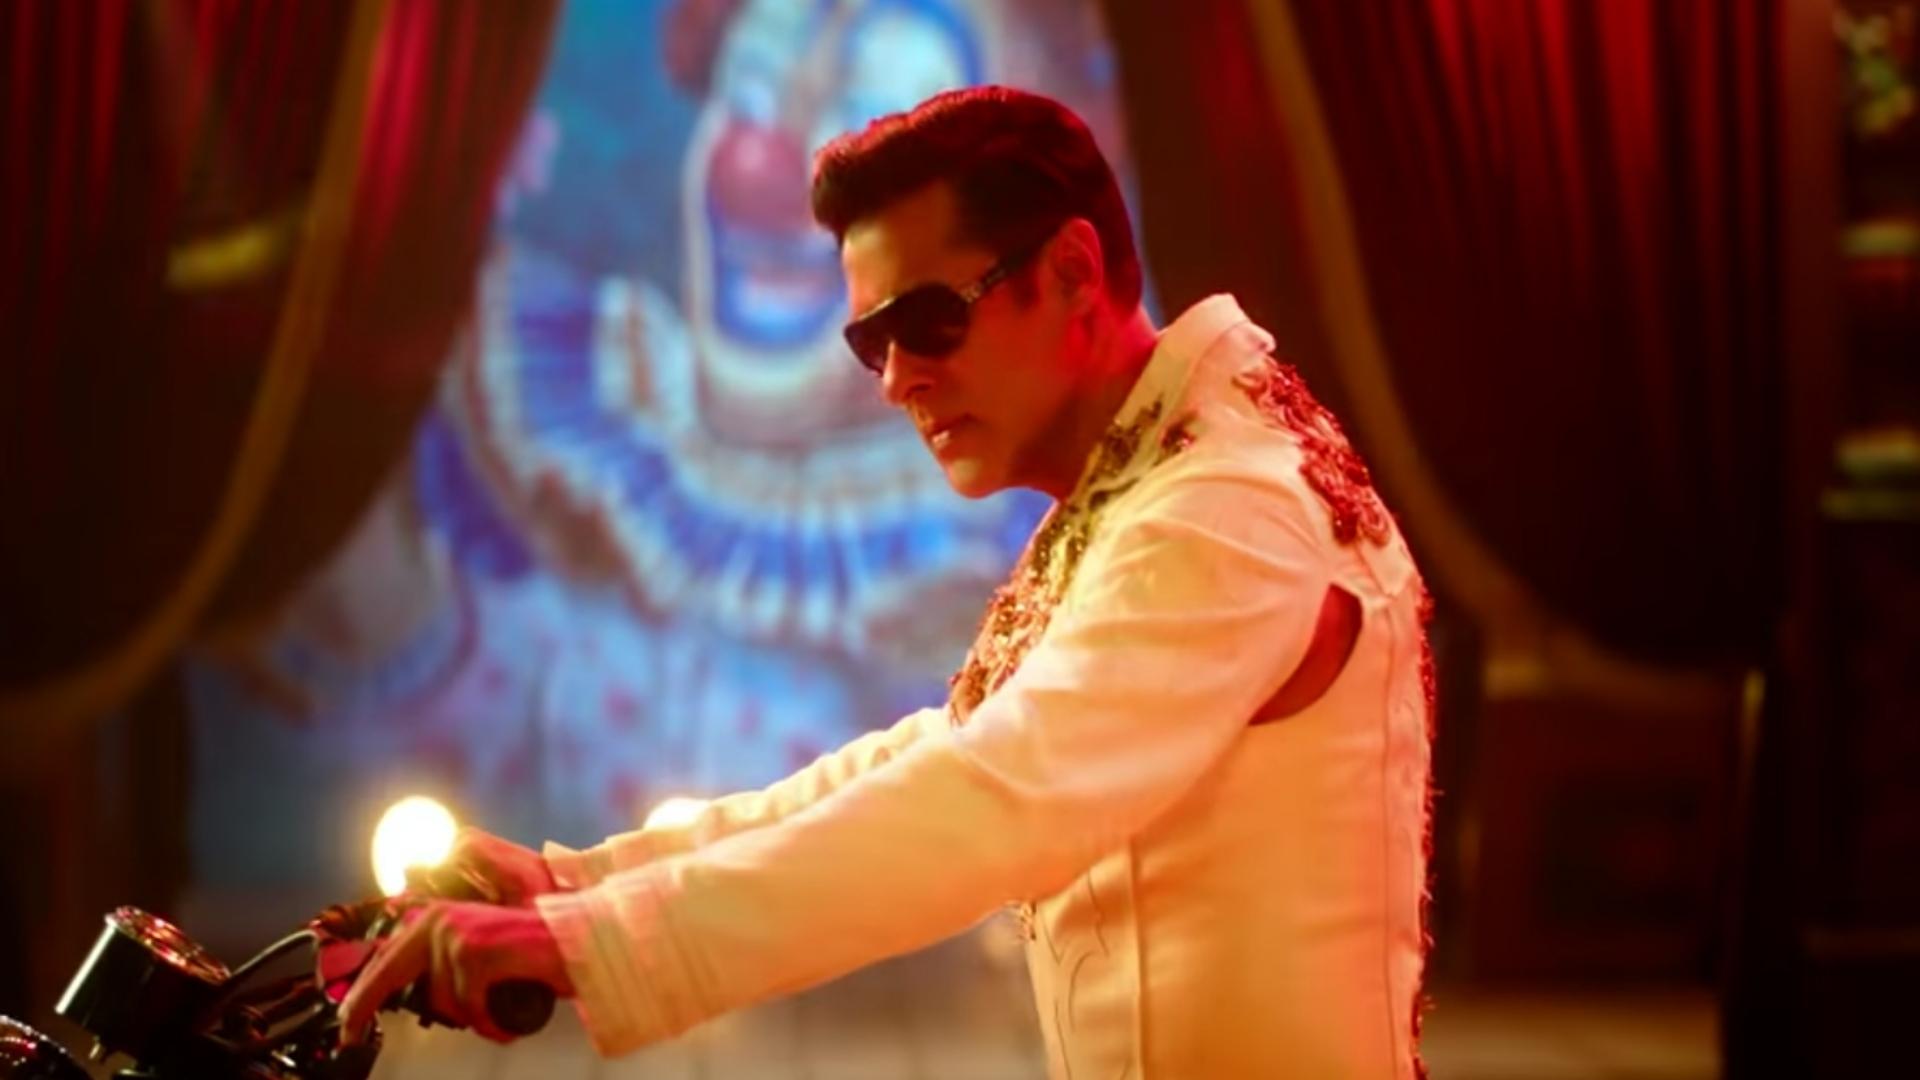 Watch Salman's Many Avatars in the Fiery 'Bharat' Teaser